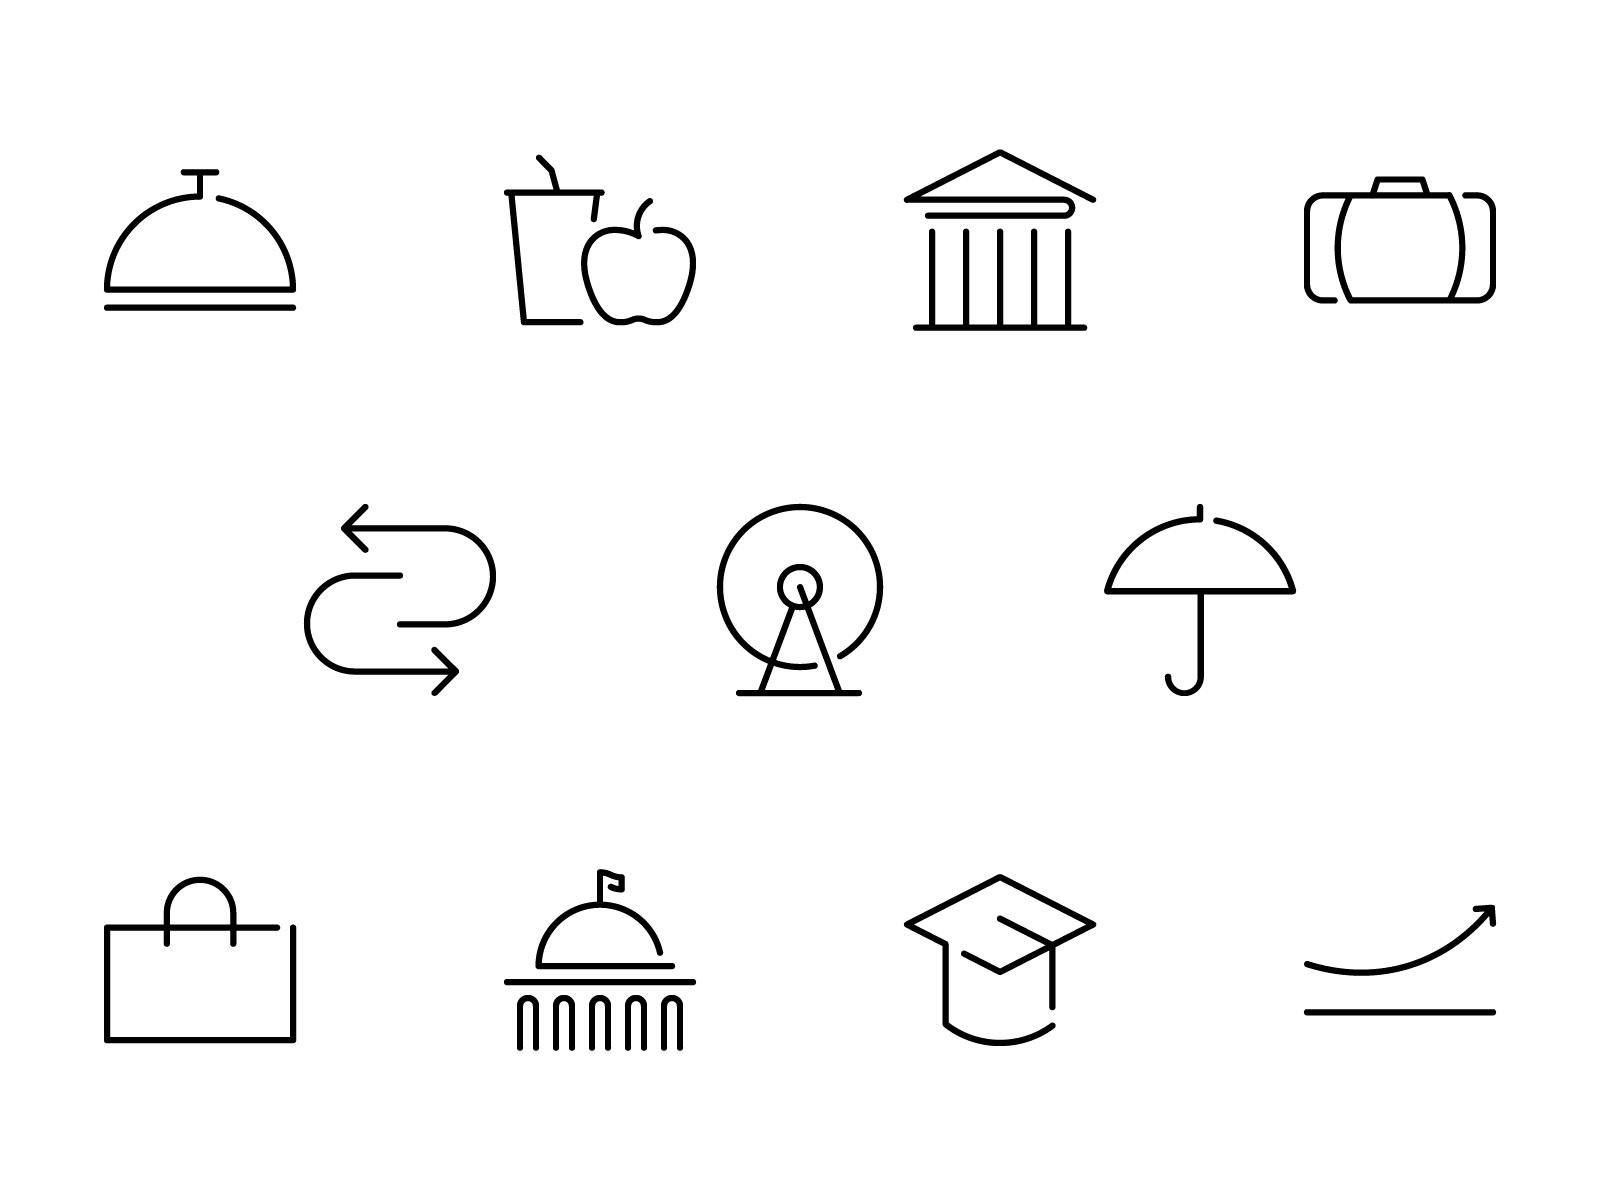 salto icons.png